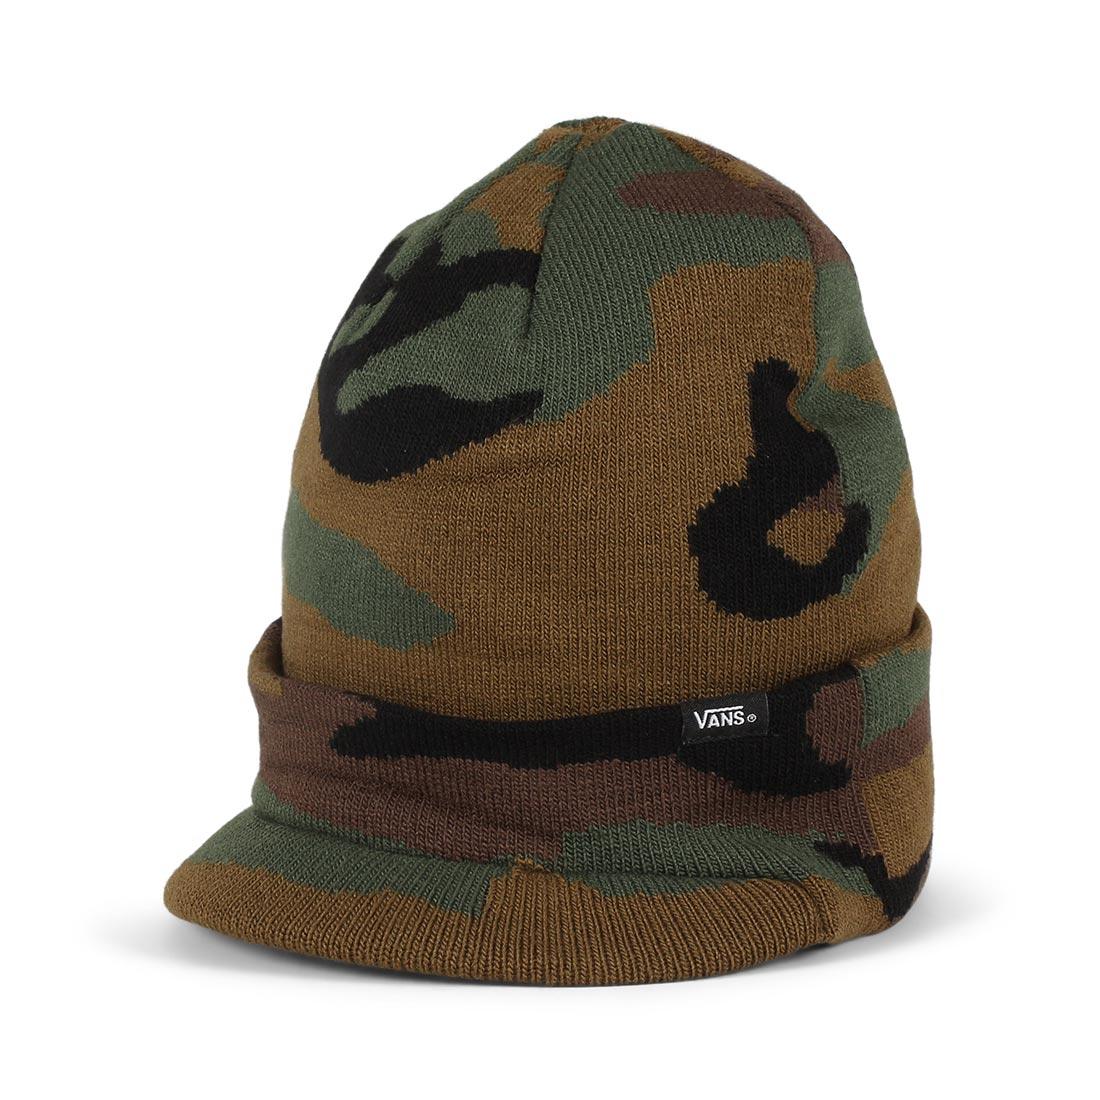 eabe32032f6b34 Vans Visor Cuff Beanie Hat – Camo